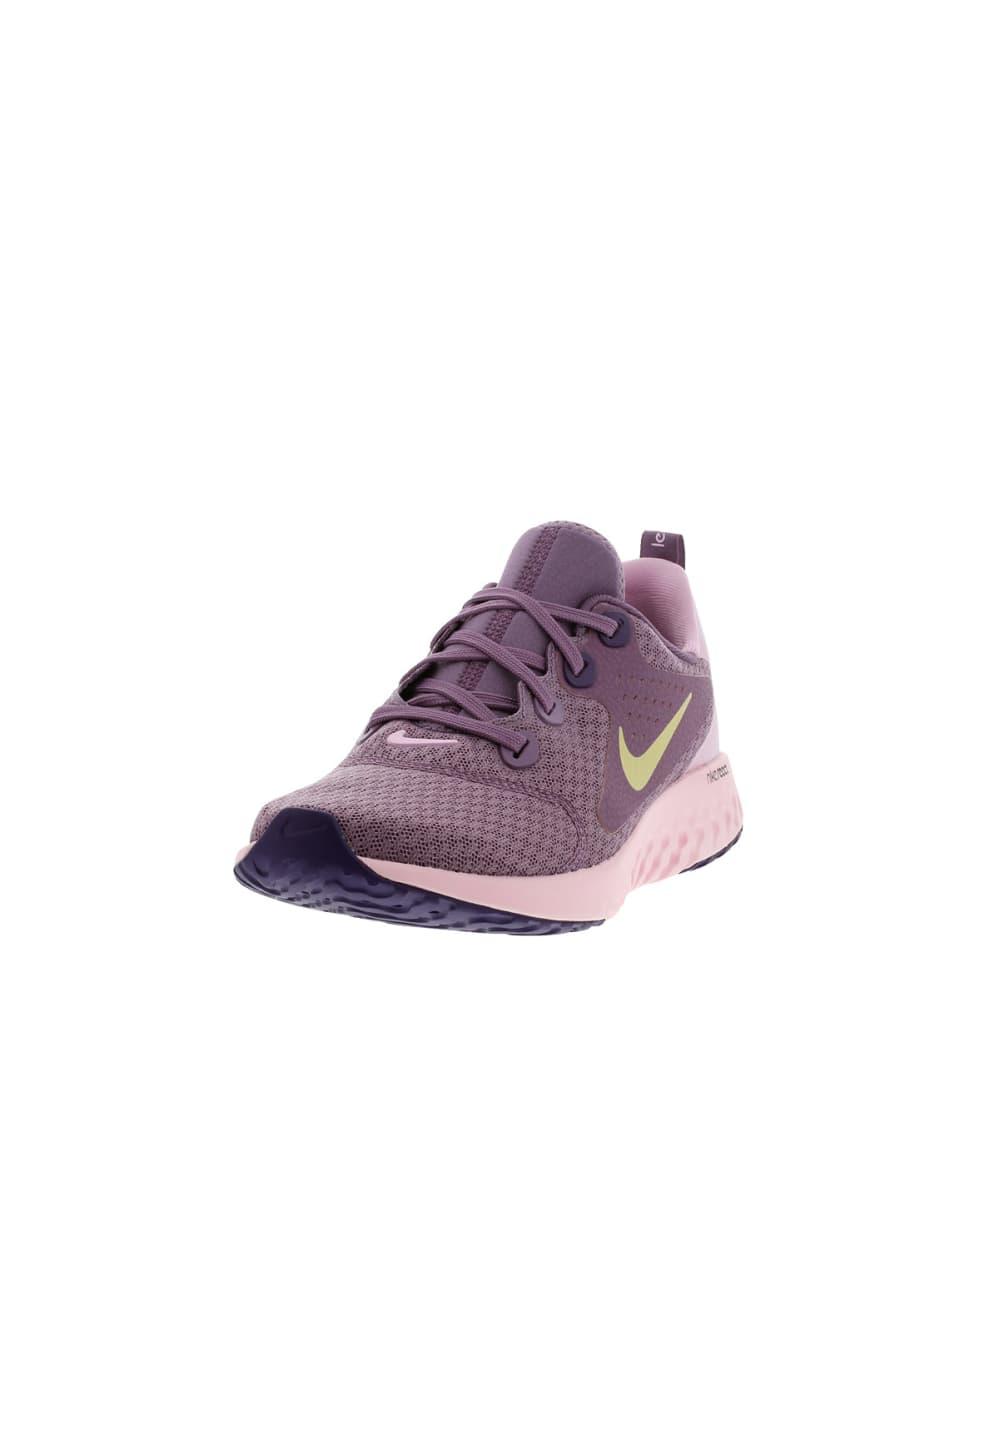 111fa05676dd91 Nike Legend React (GS) - Running shoes for Girls - Purple